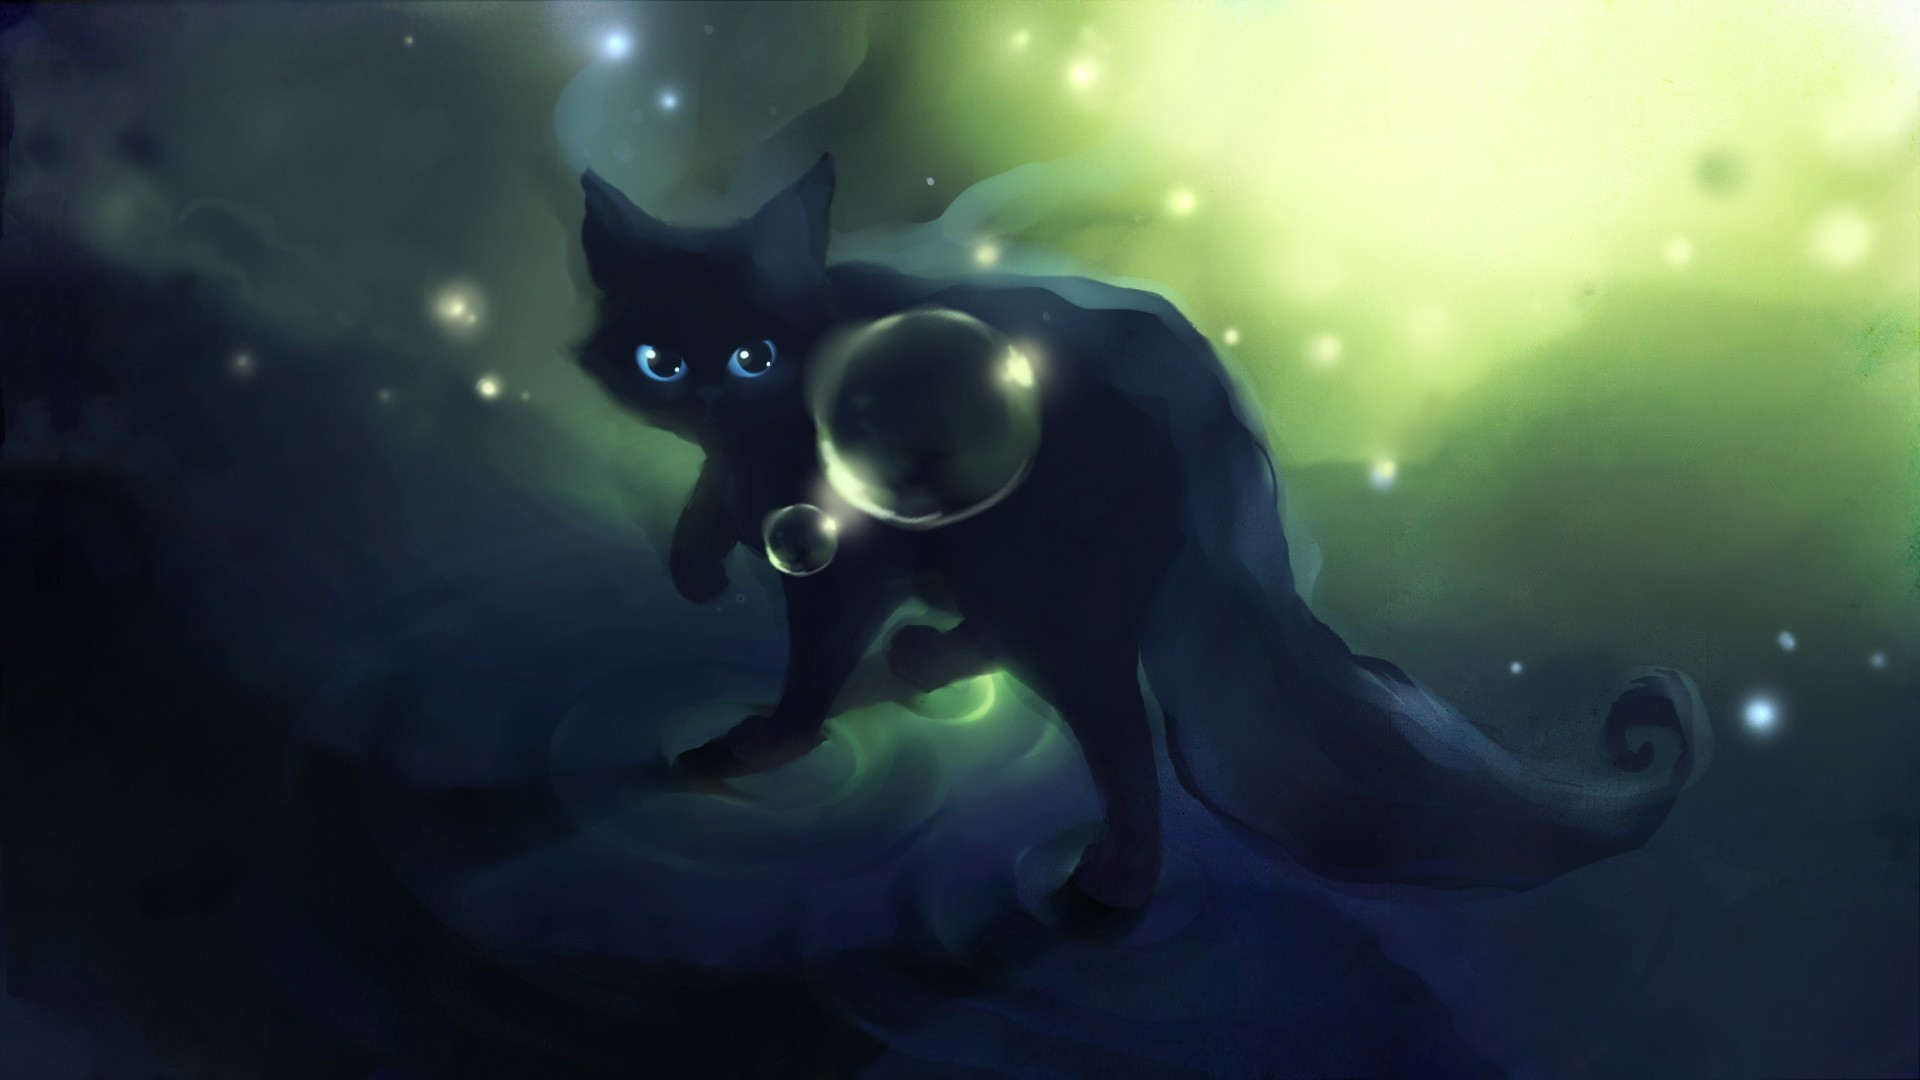 59 599715 anime black cat wallpaper desktop wallpapers hd images